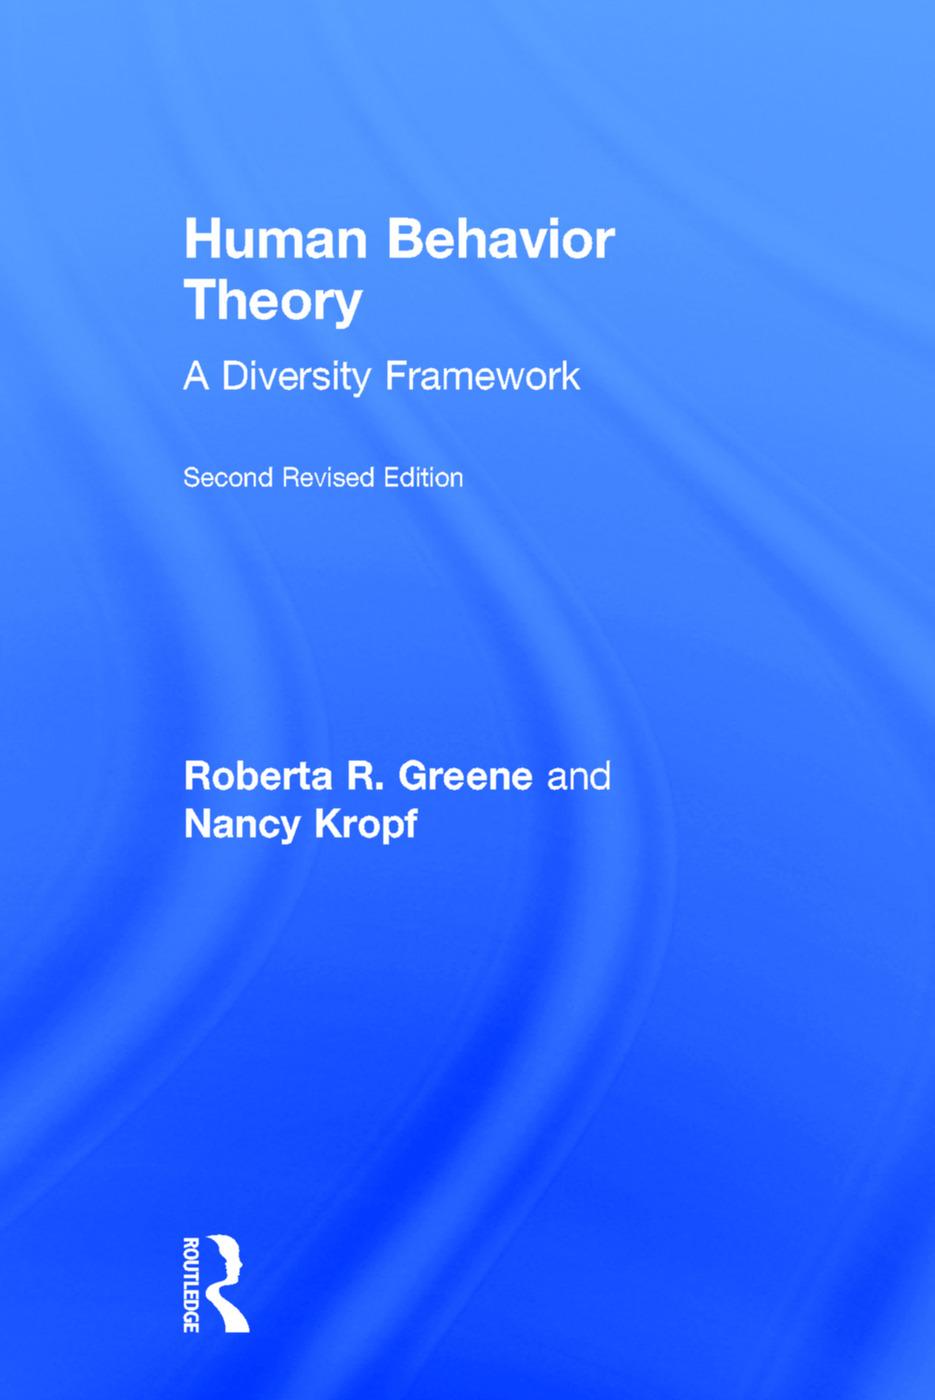 Human Behavior Theory: A Diversity Framework book cover